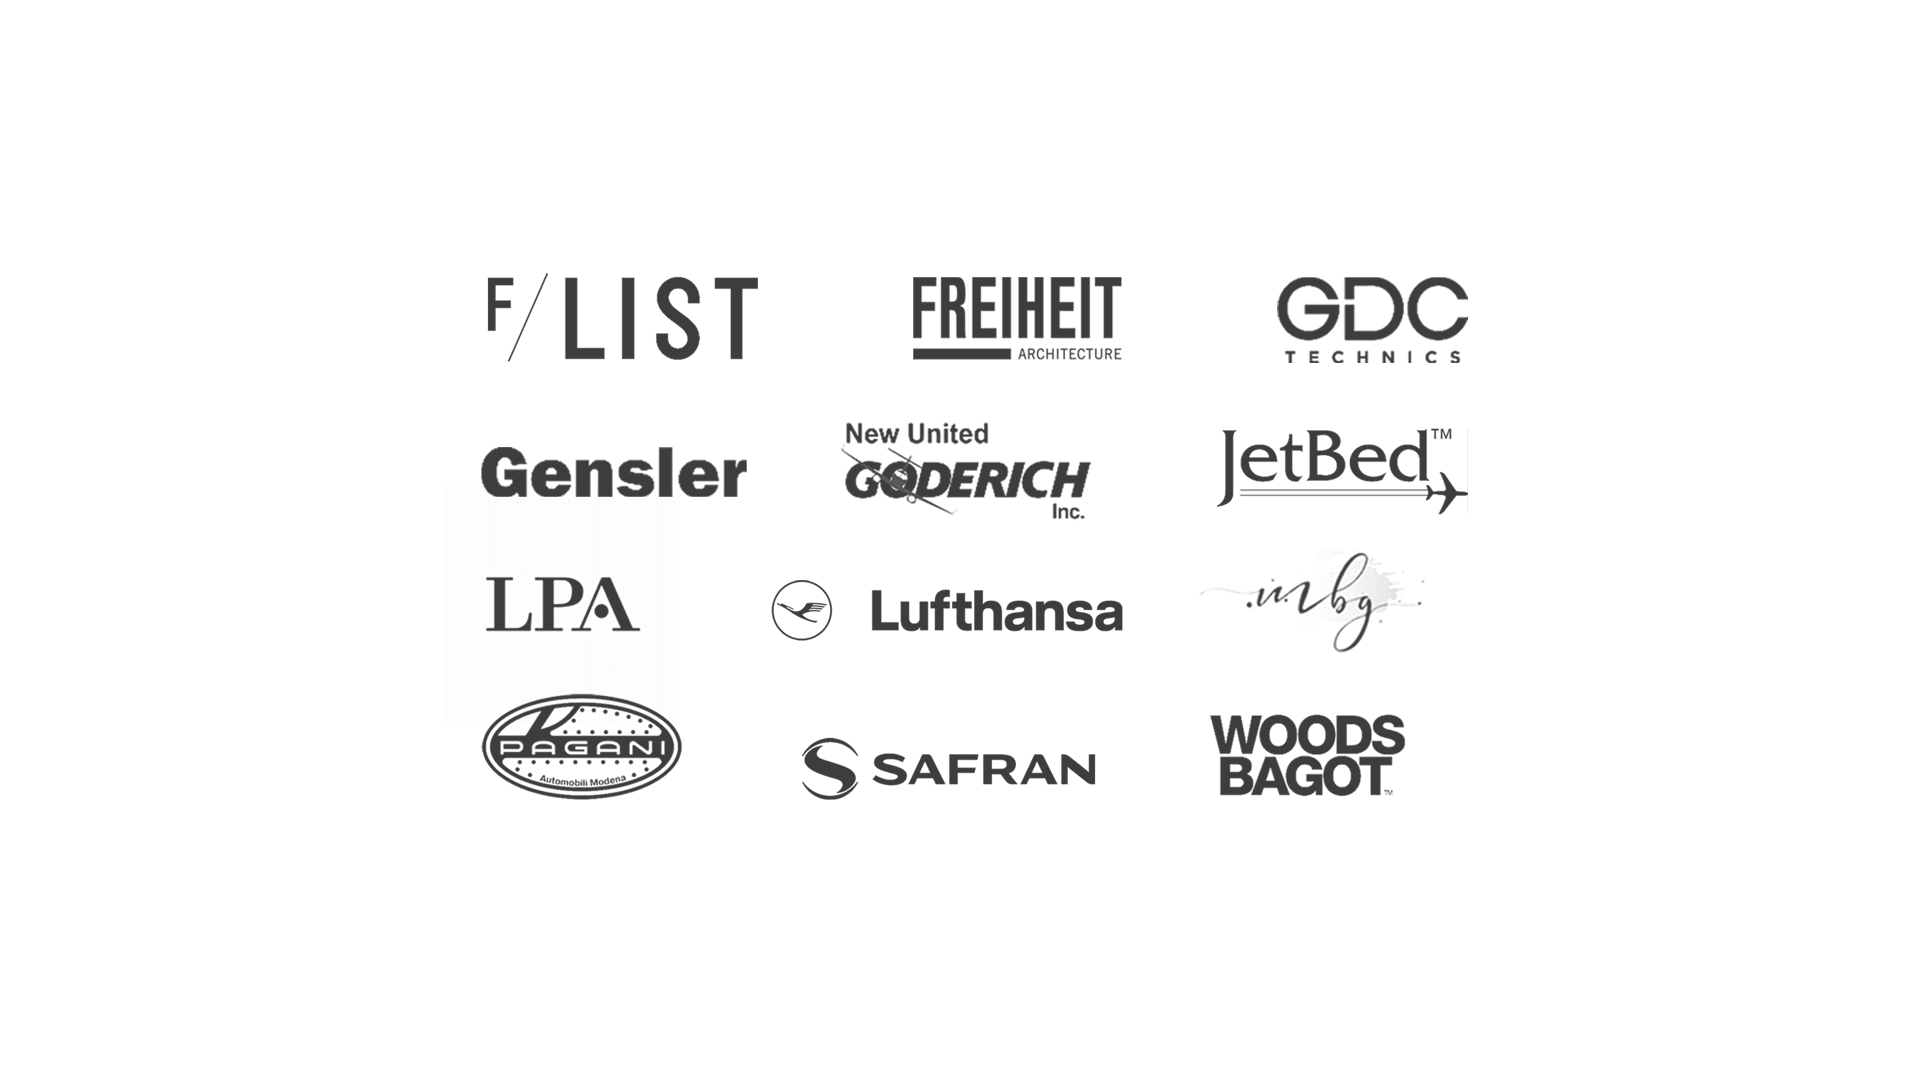 logos-clientesKiP-001